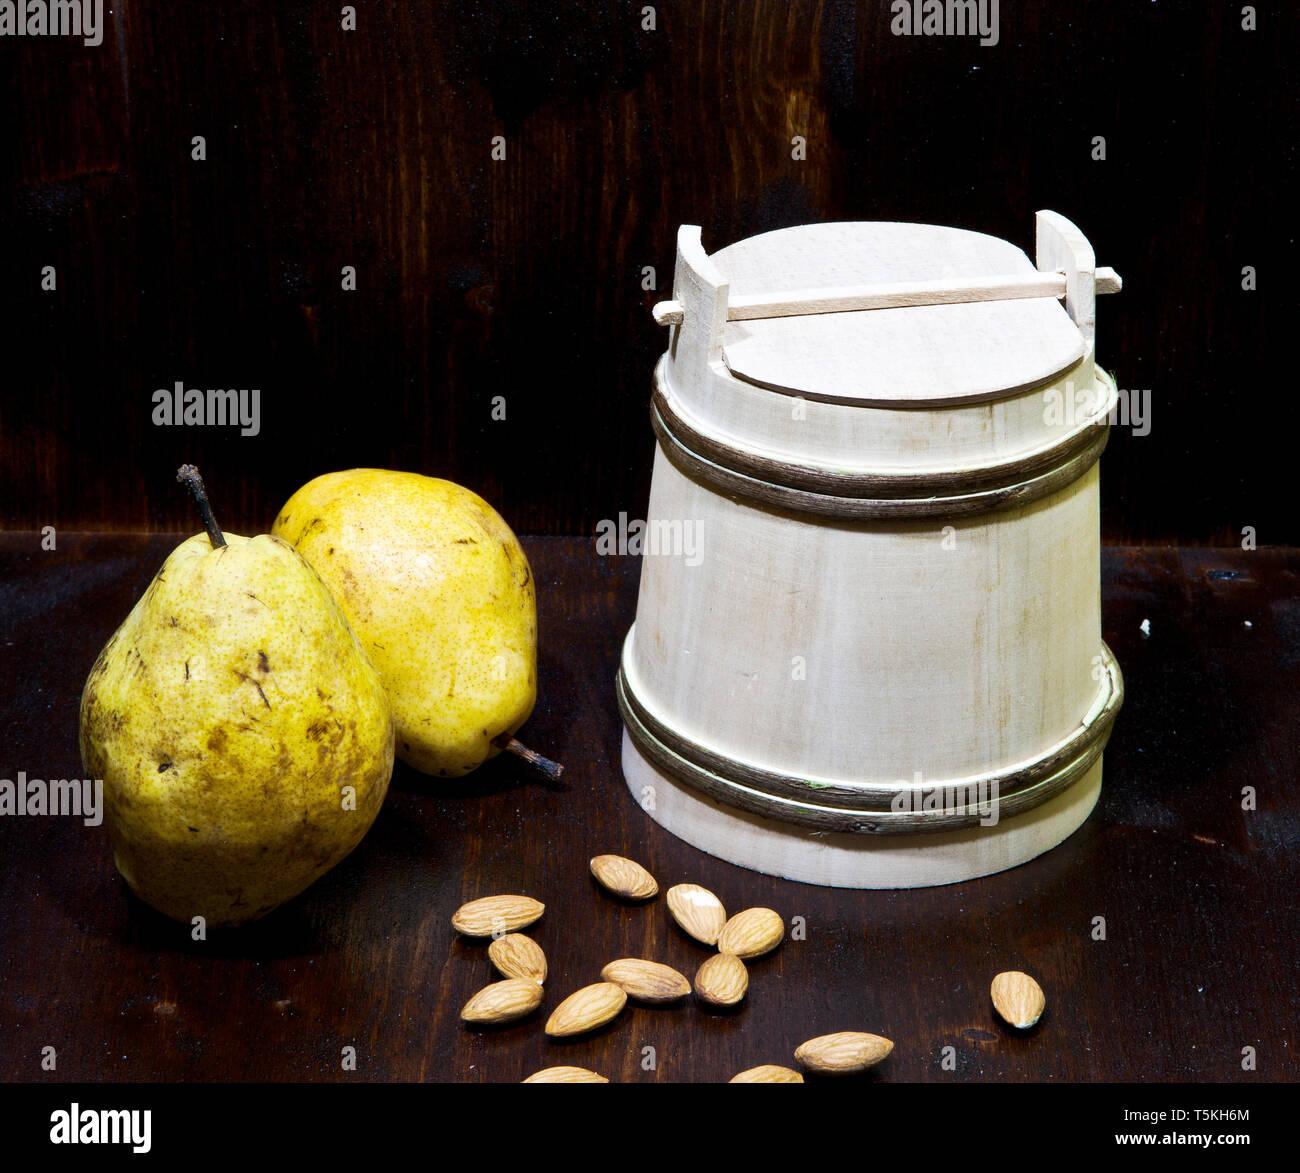 nourriture et boisson Photo Stock